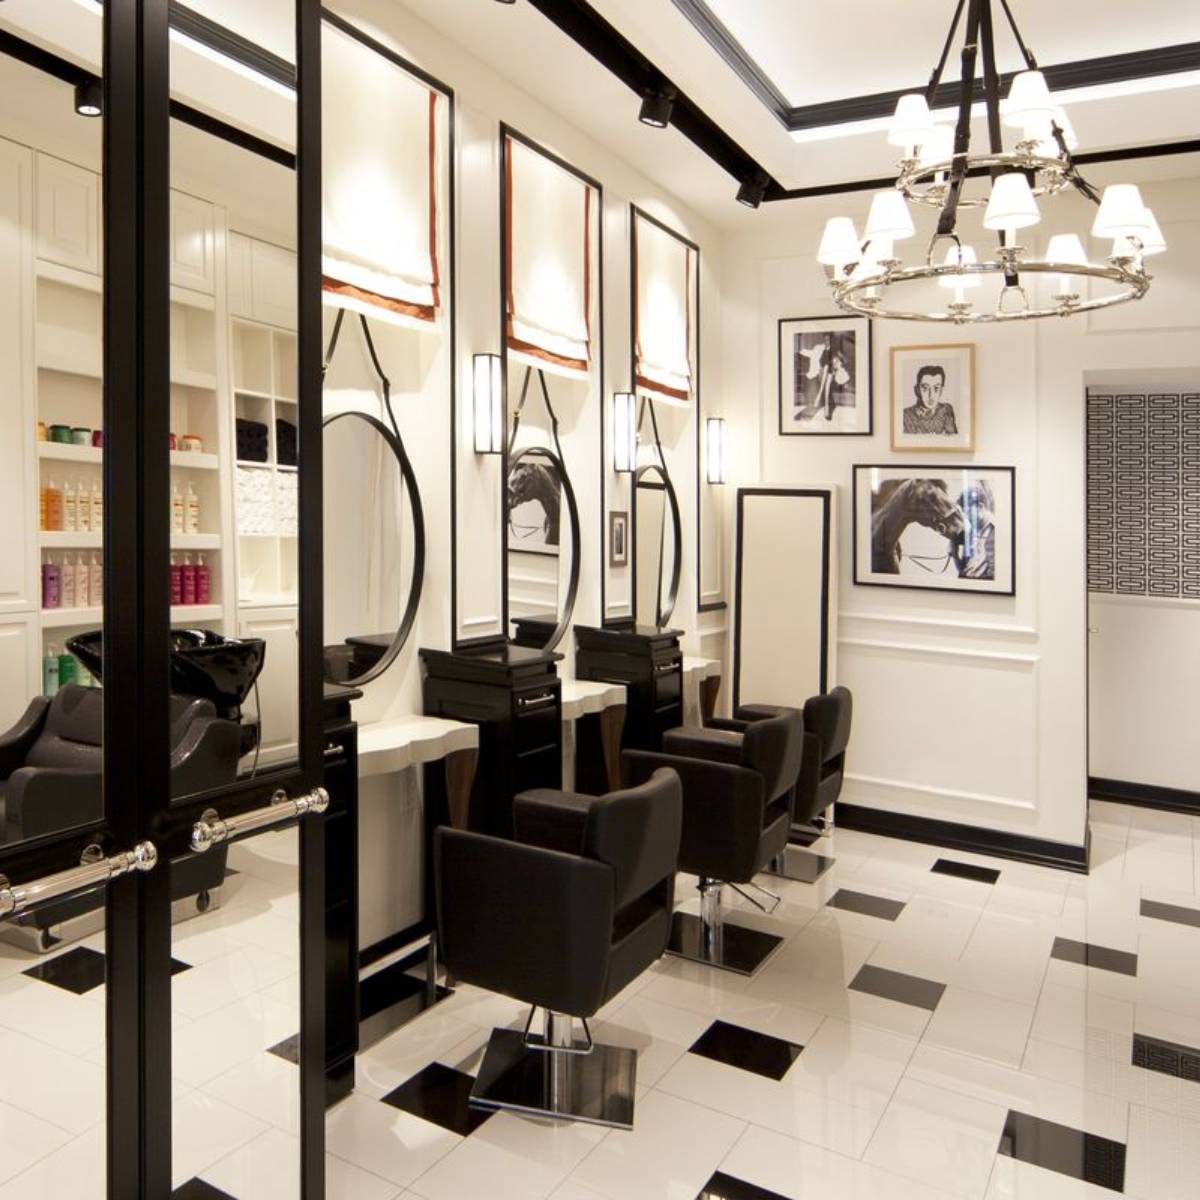 Salon Andrea Kehl Muenchen (1)